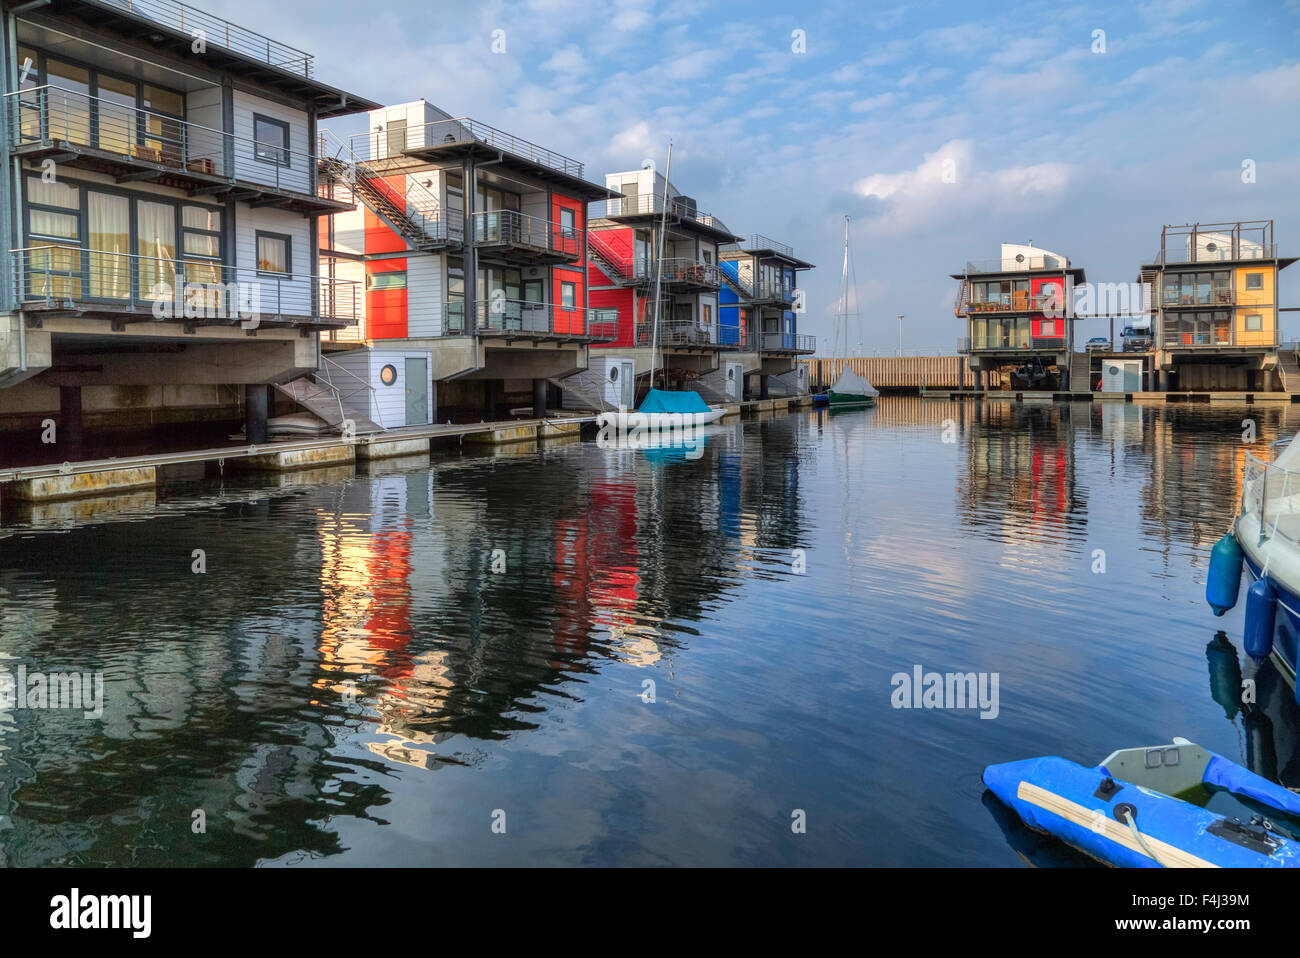 Flensburg, Sonwik l'eau, maisons, Schleswig-Holstein, Allemagne Photo Stock